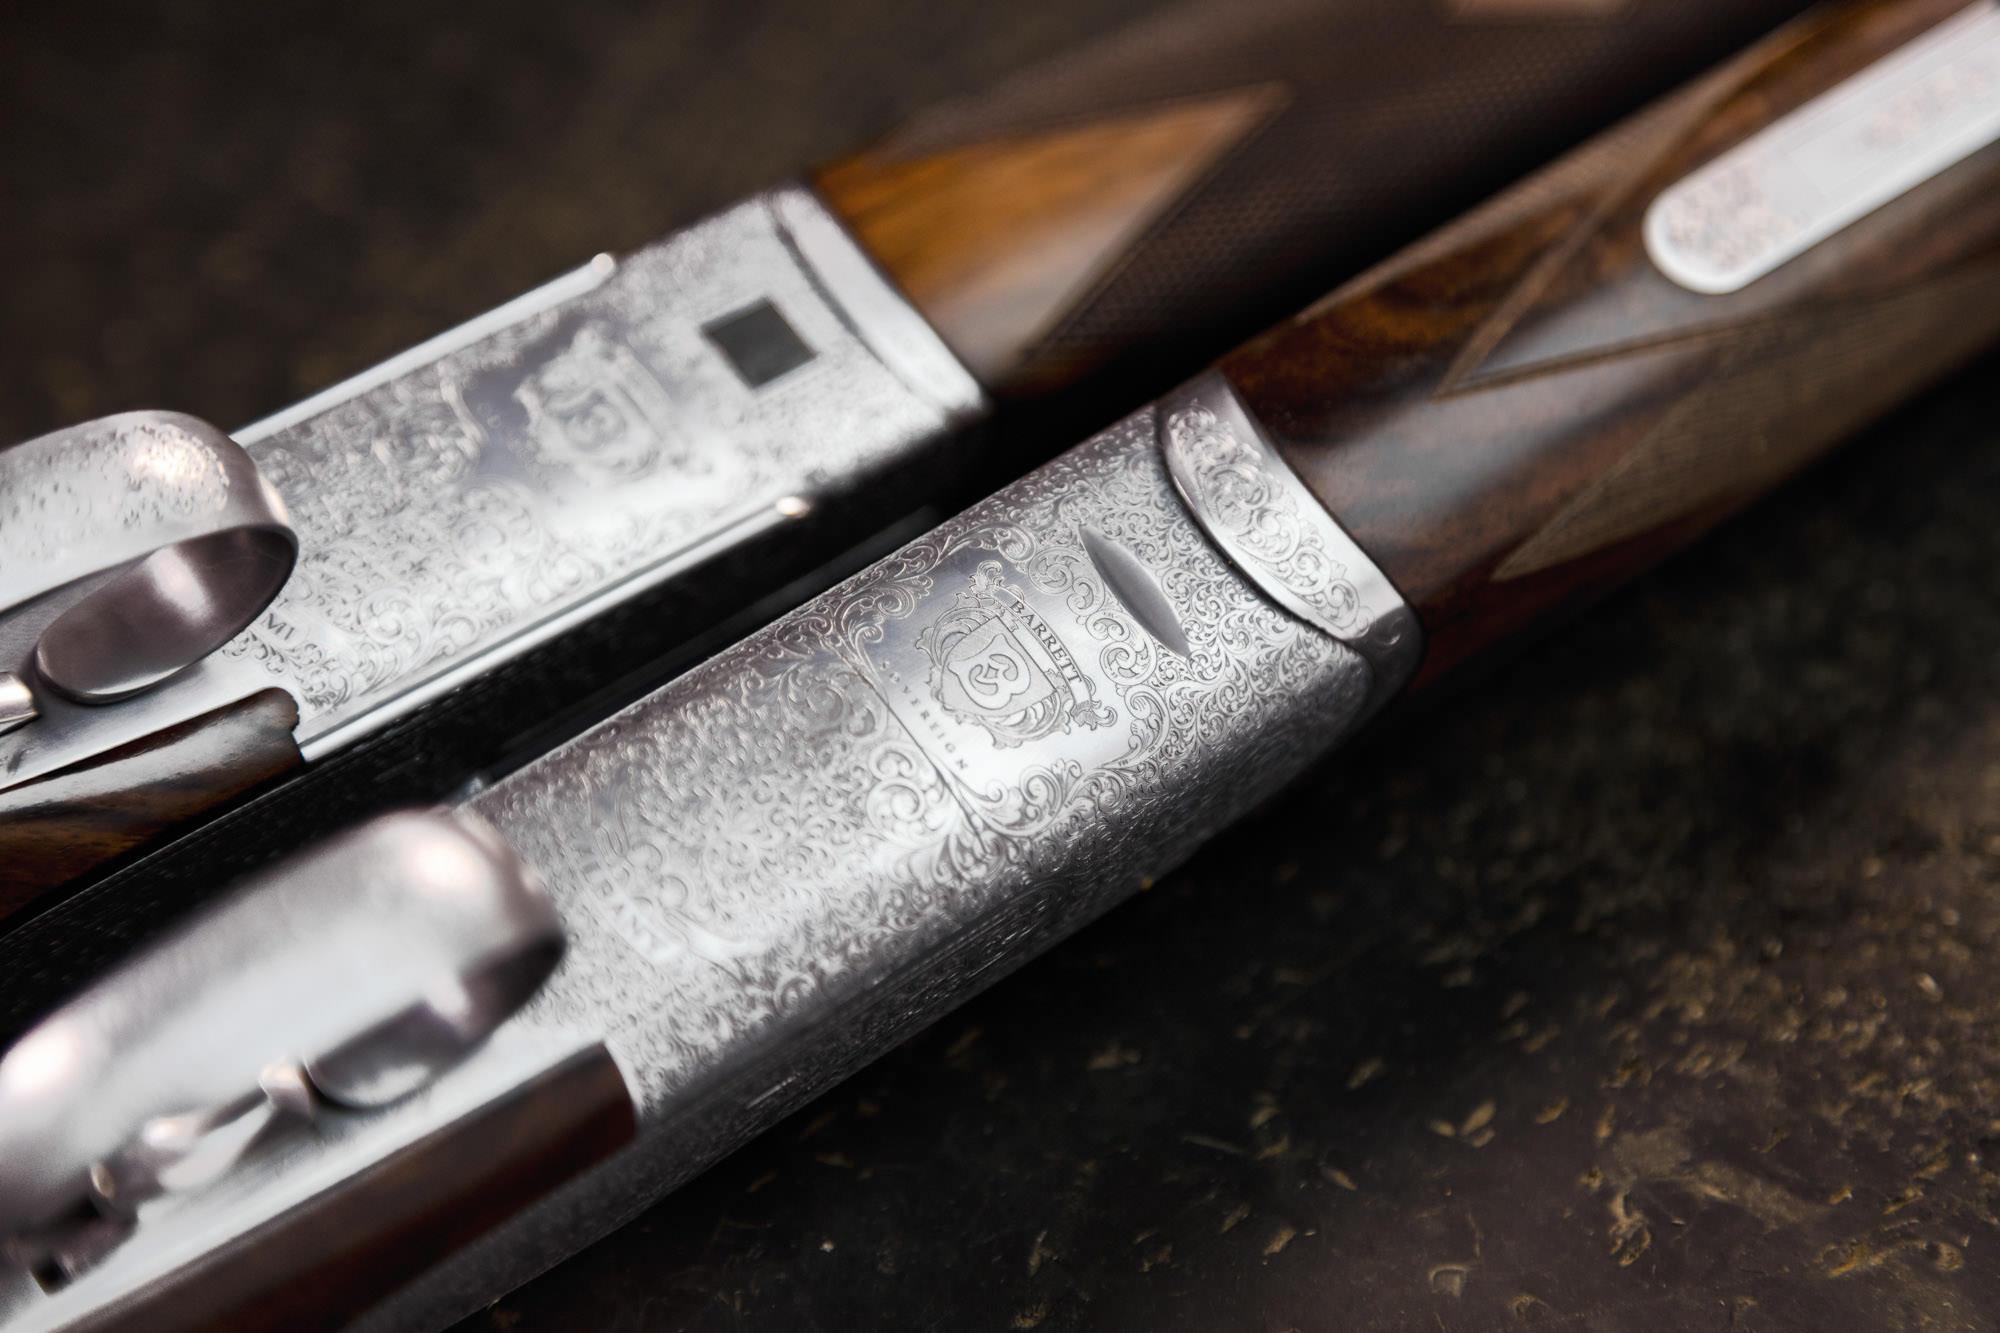 Nashville product photographers shot this image for the Barrett Gun Company